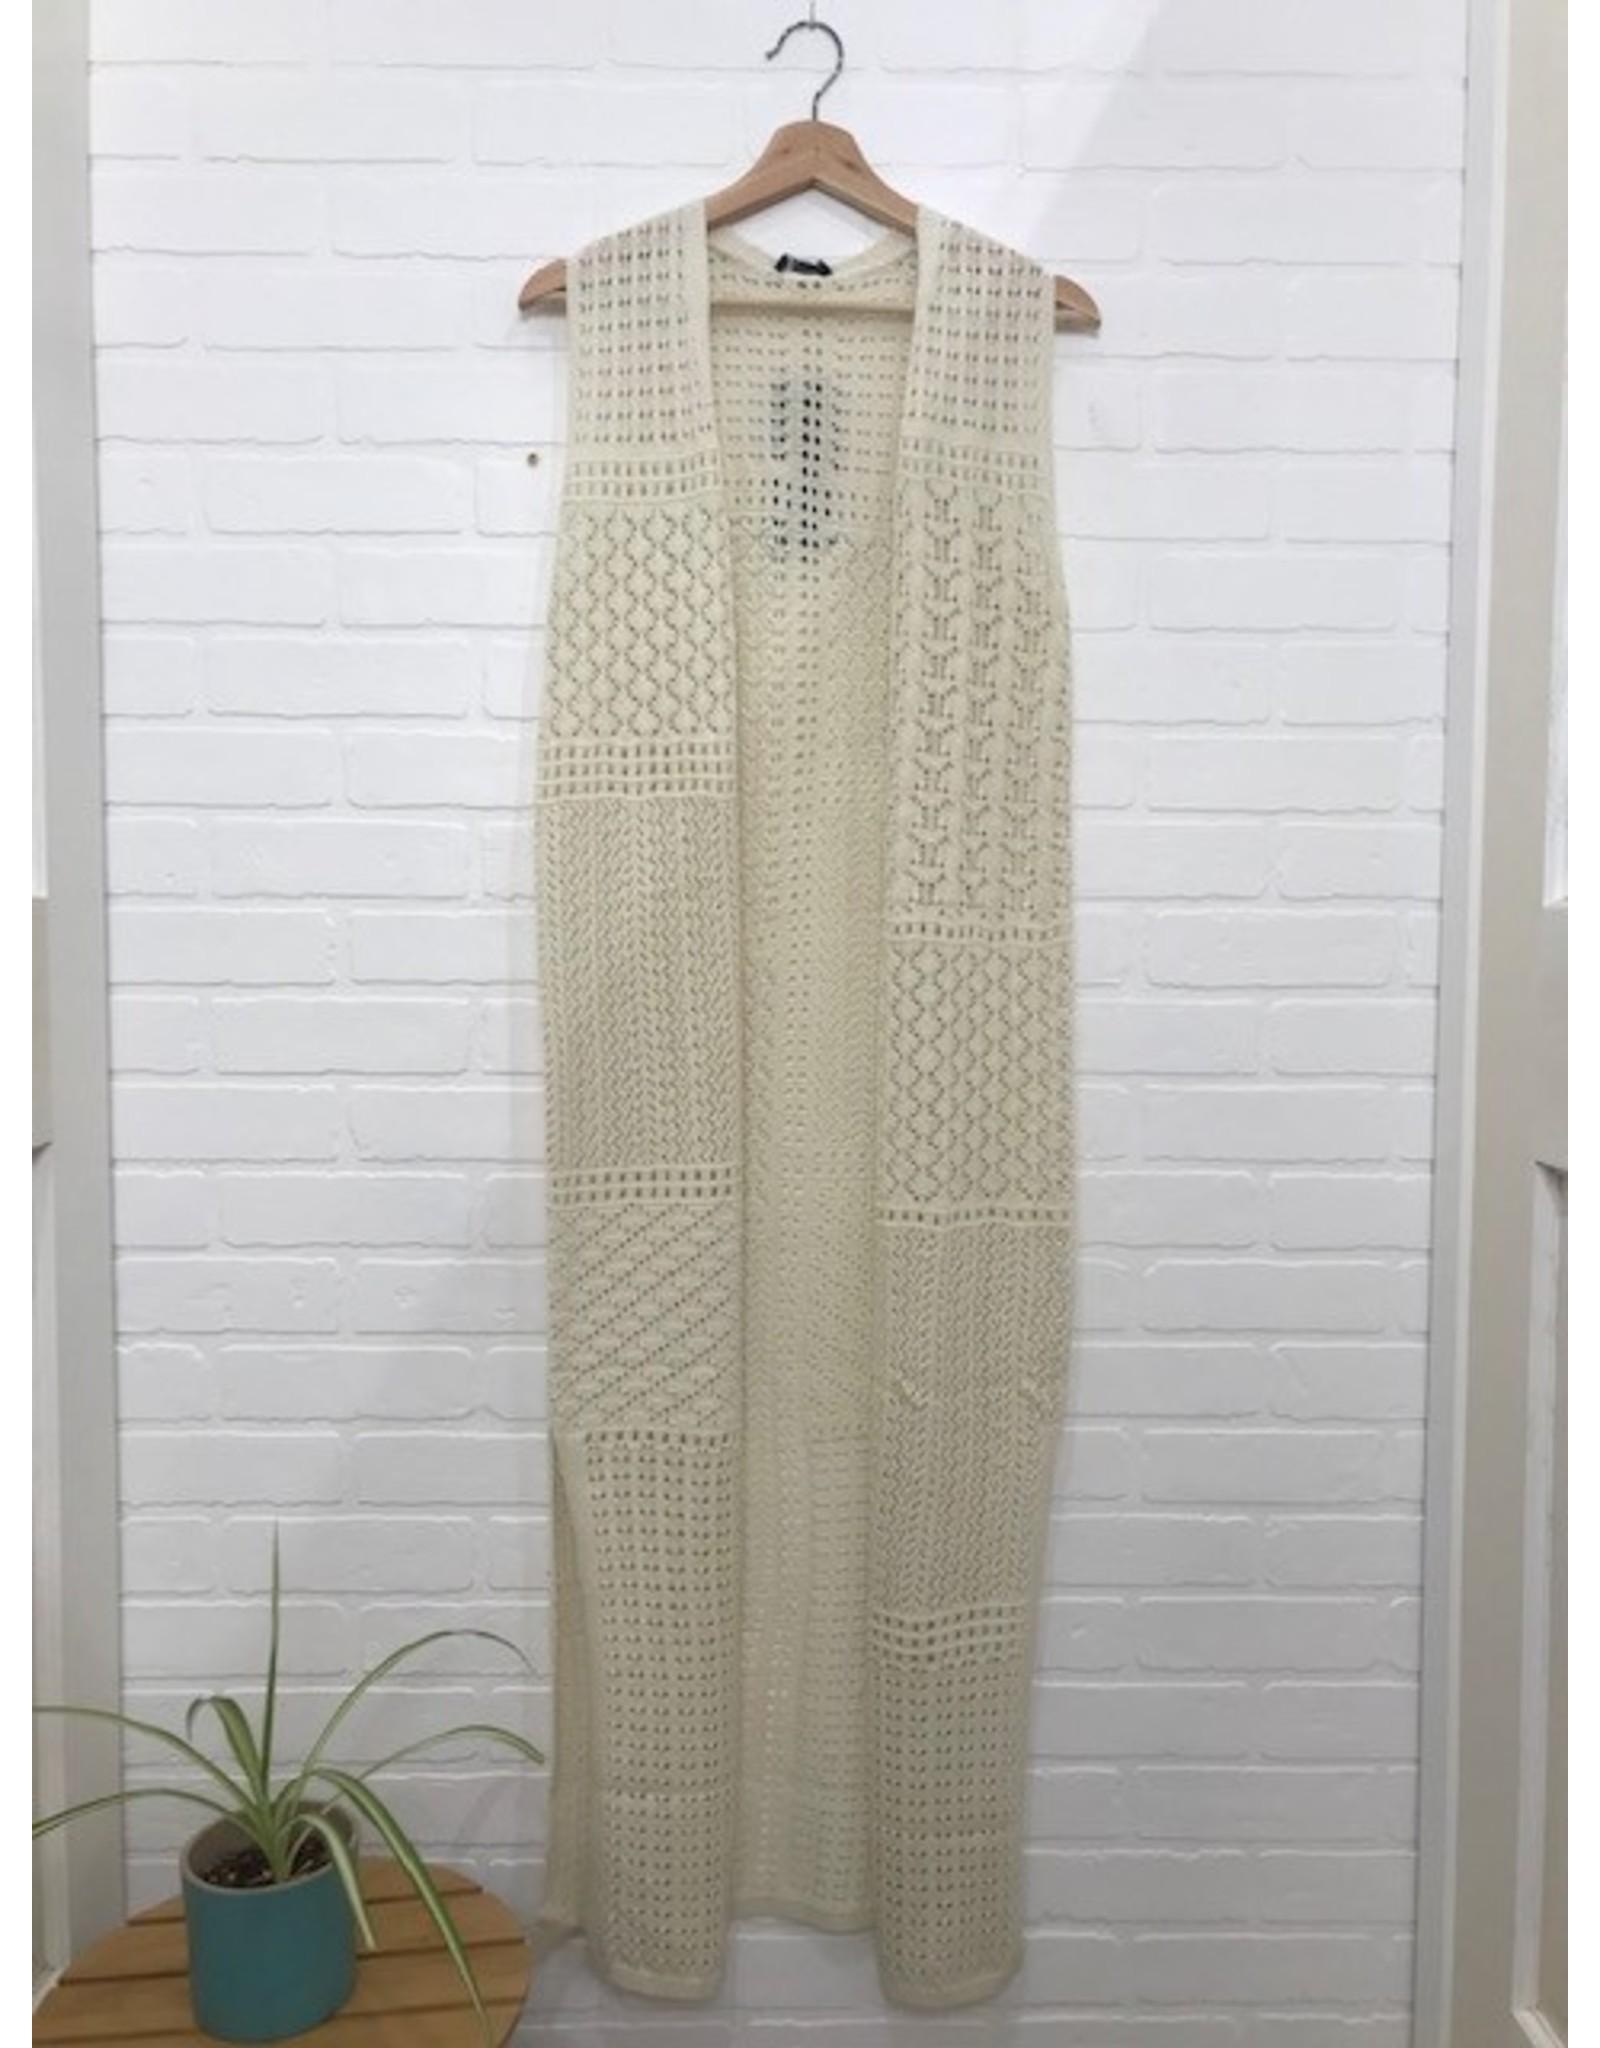 Yest Yest - Kimberley cardigan (sandy white)